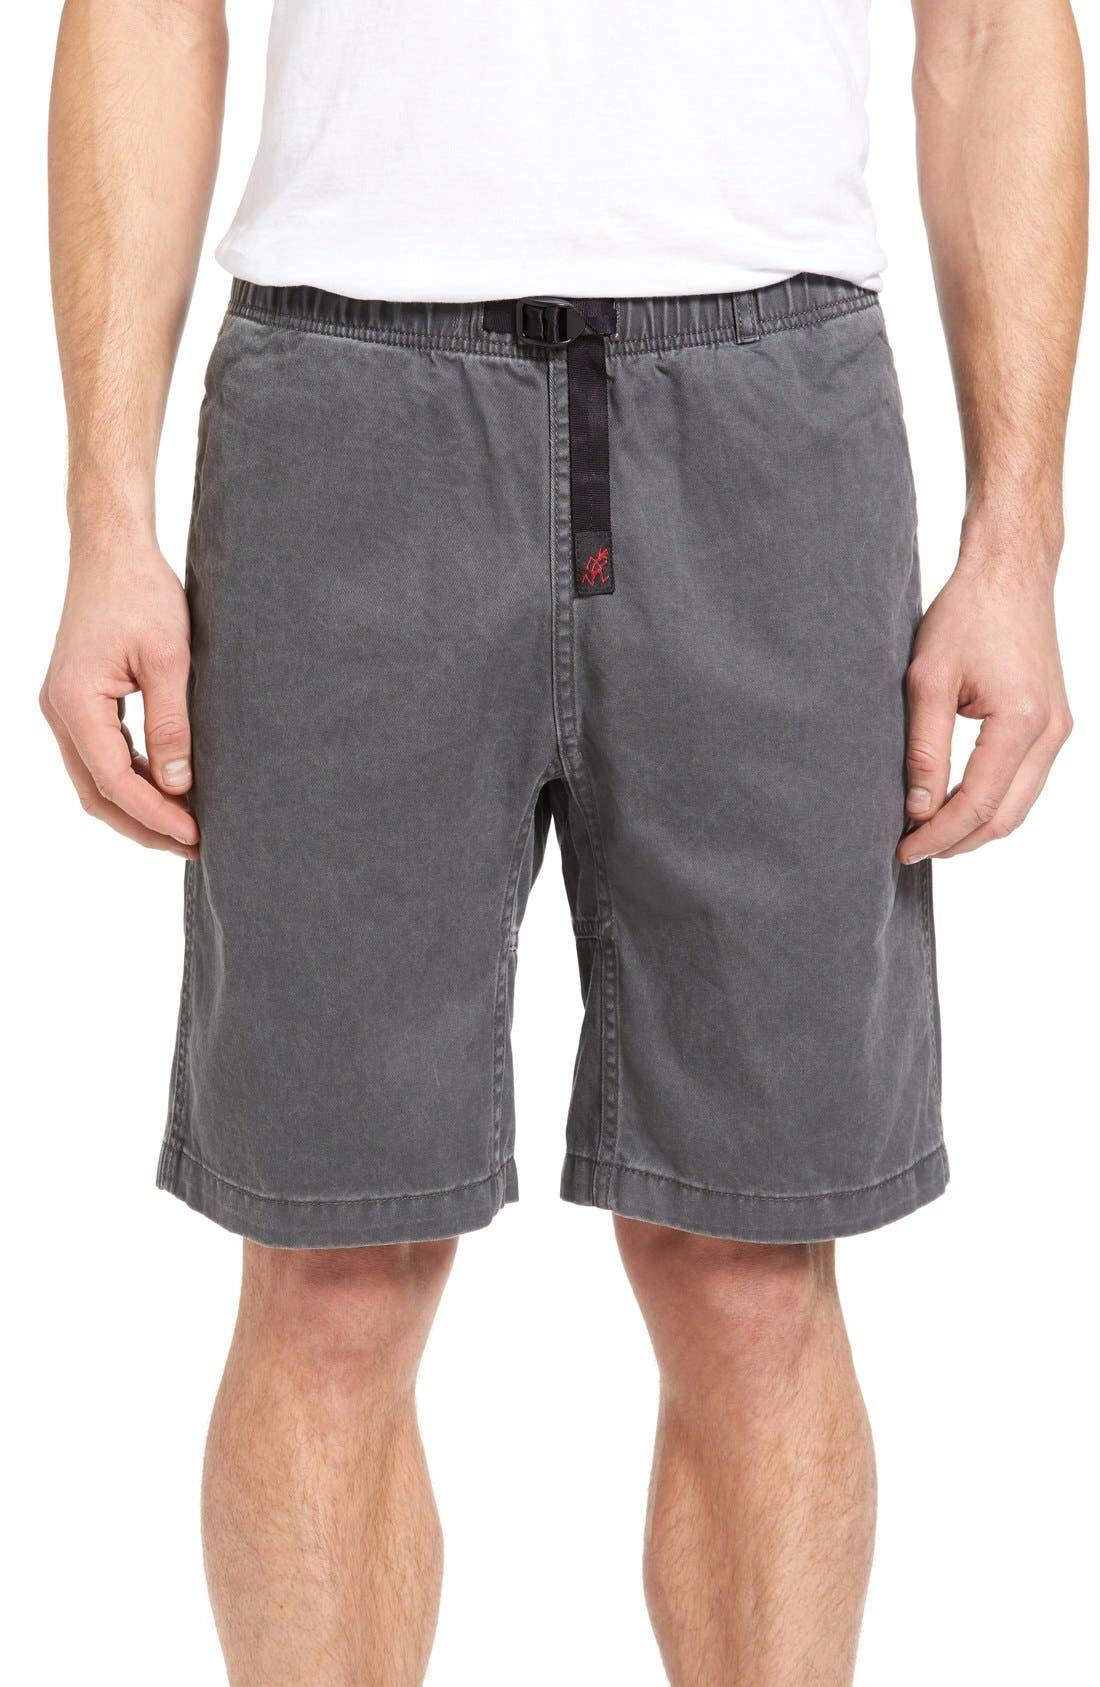 Rockin Sport Shorts,                             Main thumbnail 1, color,                             Asphalt Grey